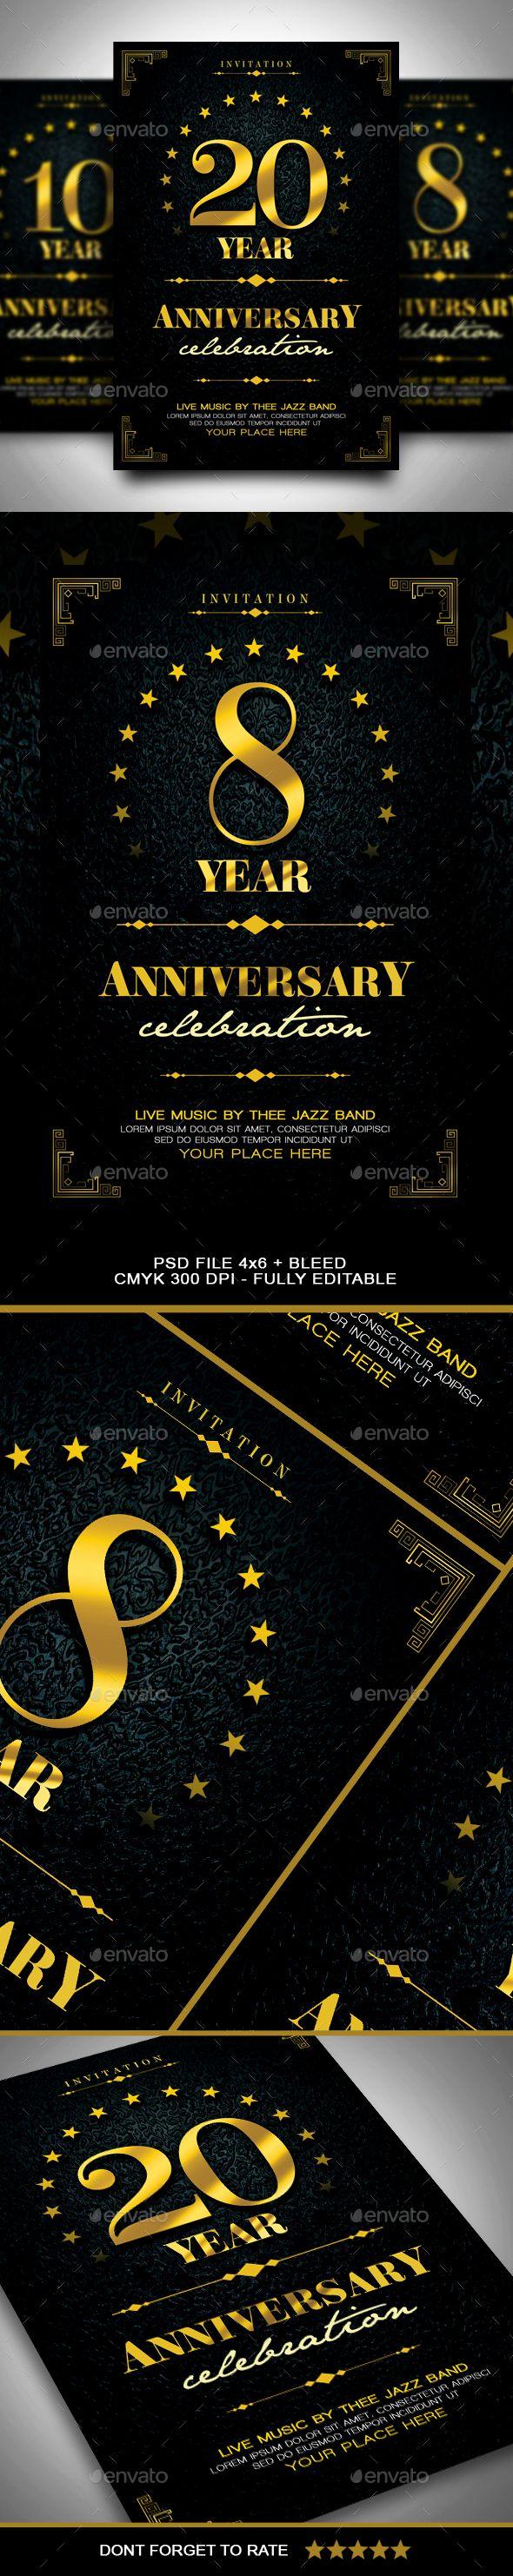 #Anniversary #Invitation - Anniversary Greeting Cards Download here: https://graphicriver.net/item/anniversary-invitation/19805776?ref=classicdesignp